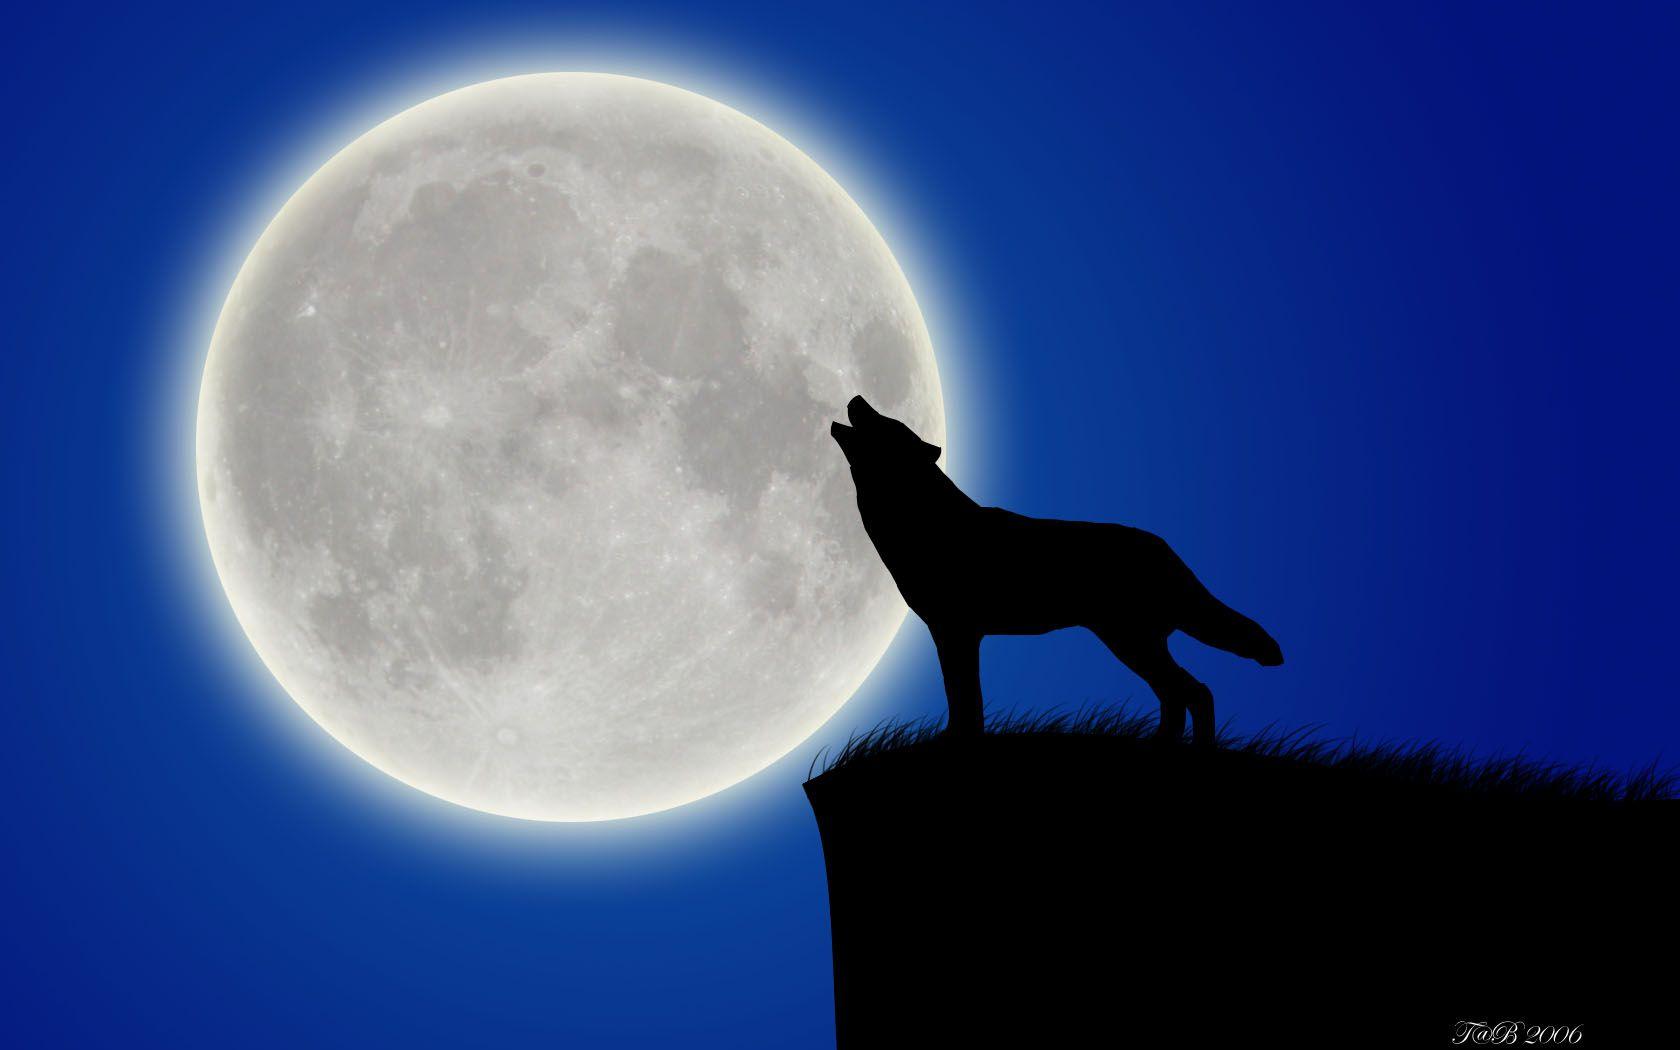 однобалочным картинка волк рисунка луна клумбы